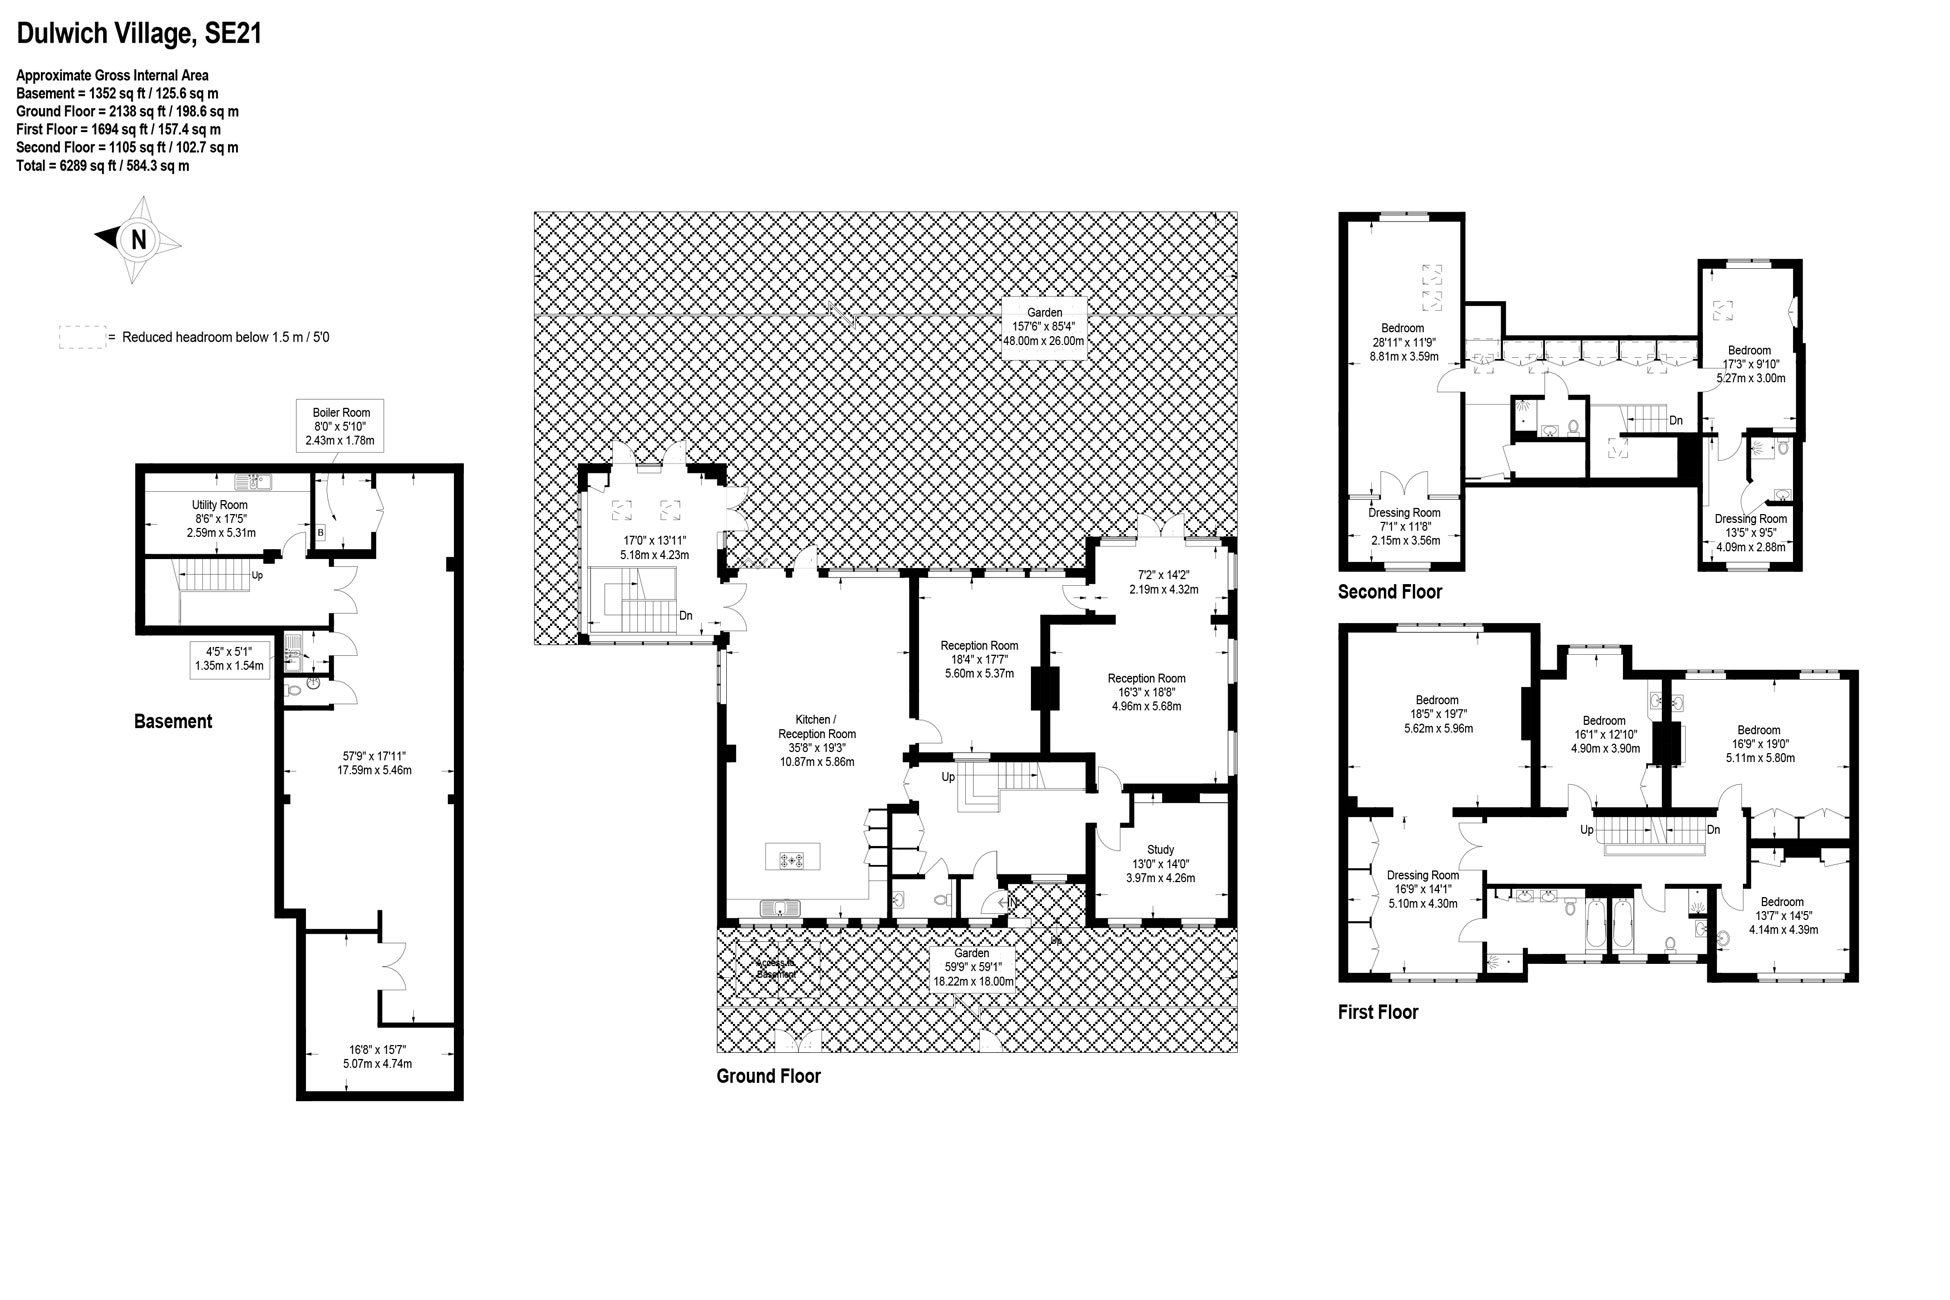 Floor plan for residential property